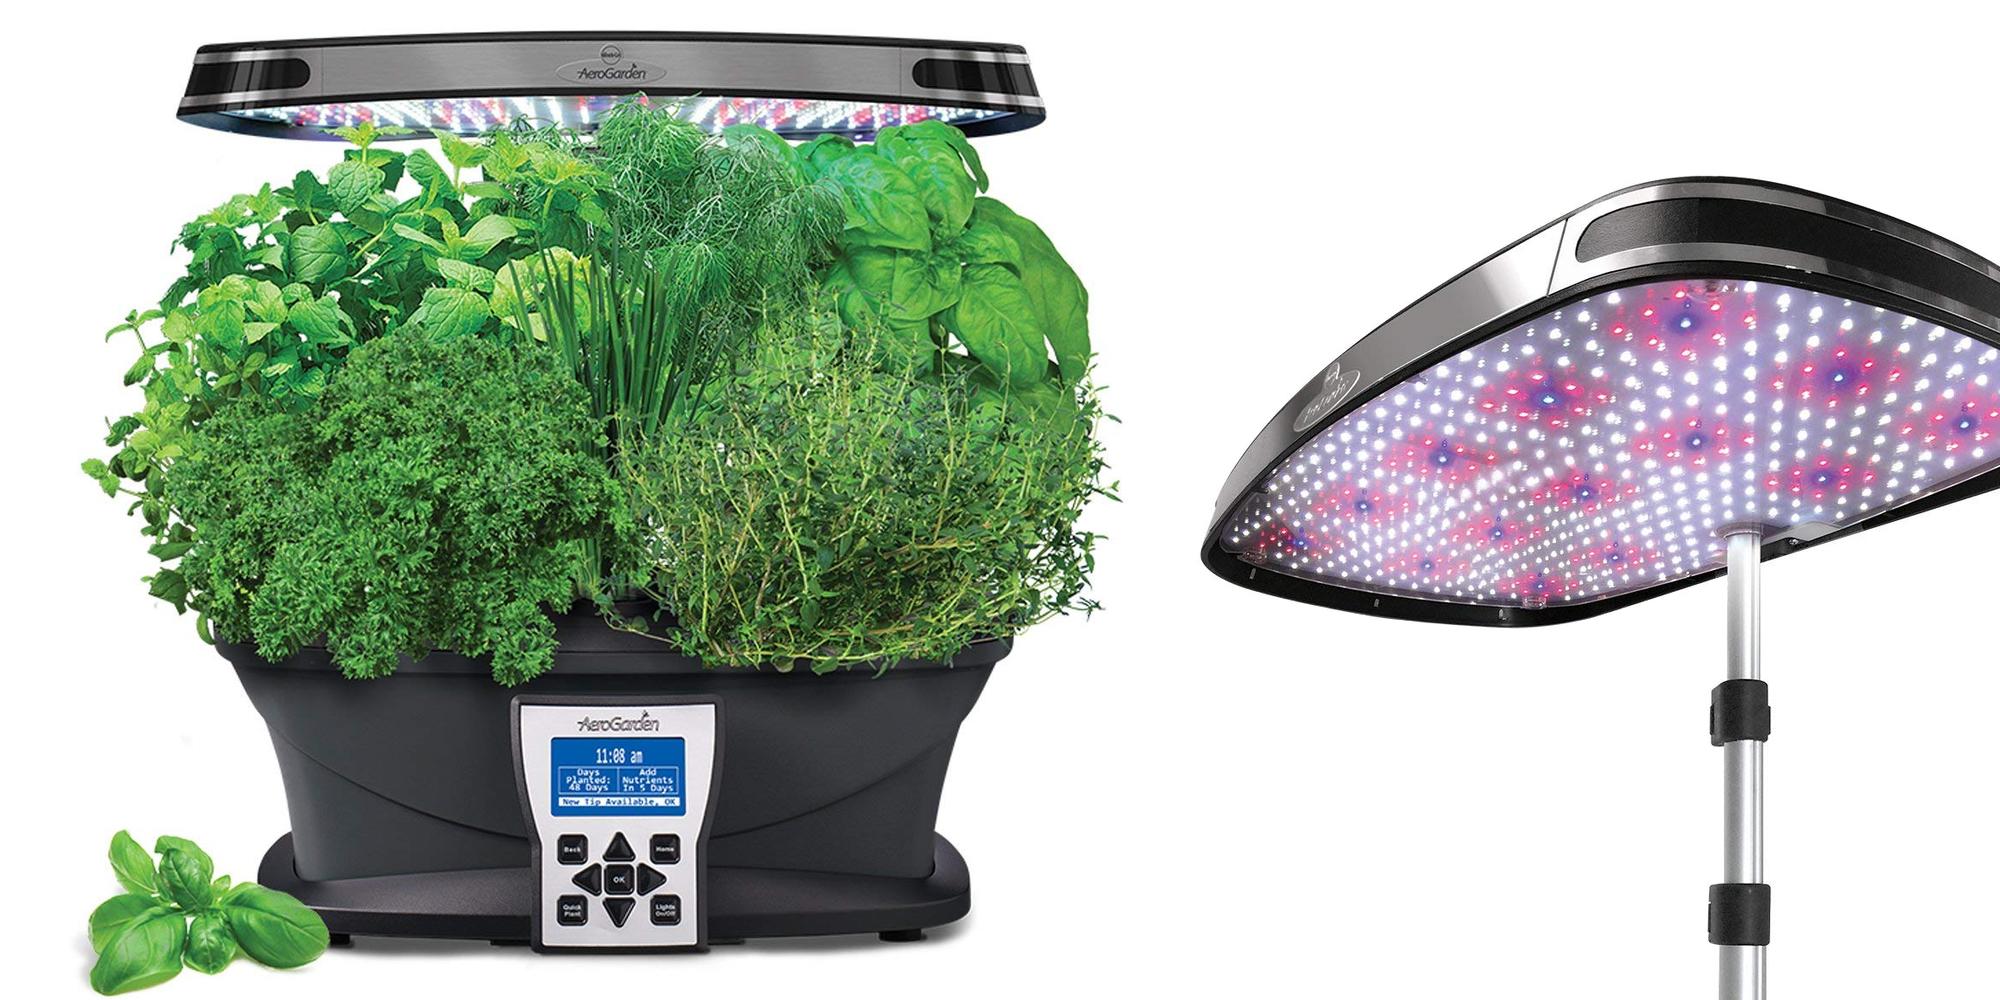 AeroGarden Ultra grows up to seven herbs or spices at $120 Prime shipped (Reg. $190)